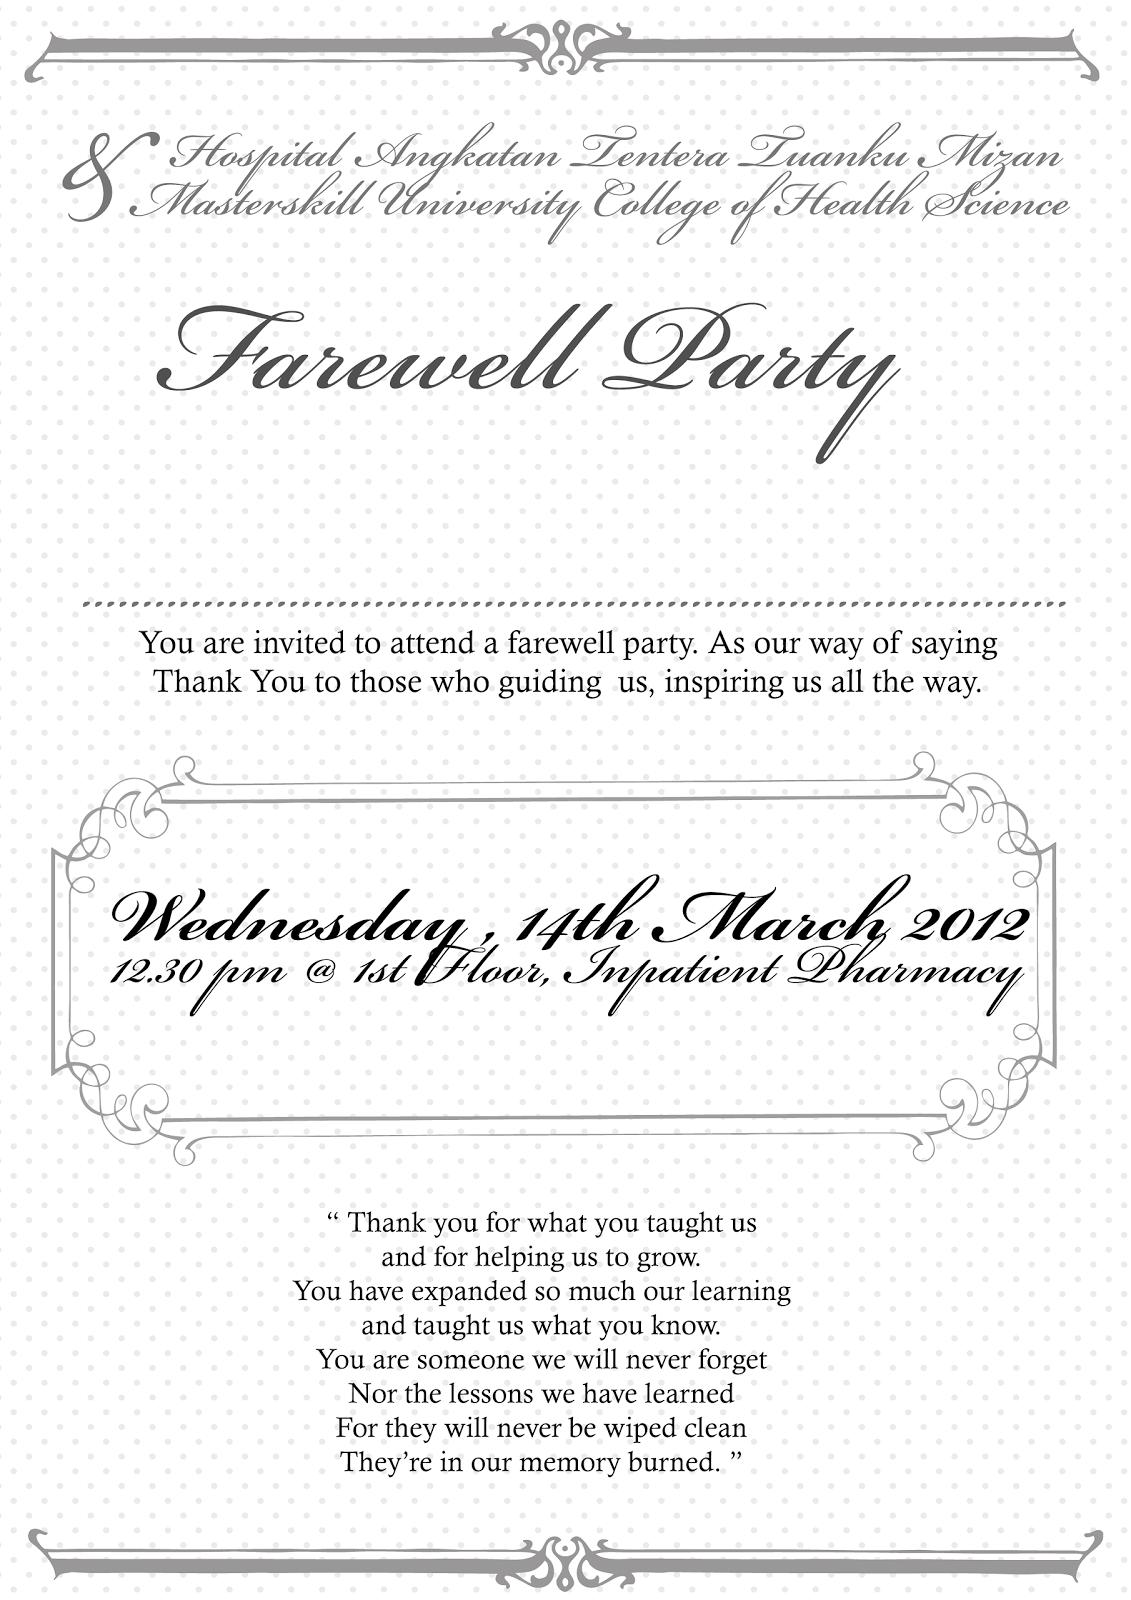 Farewell Party Invites